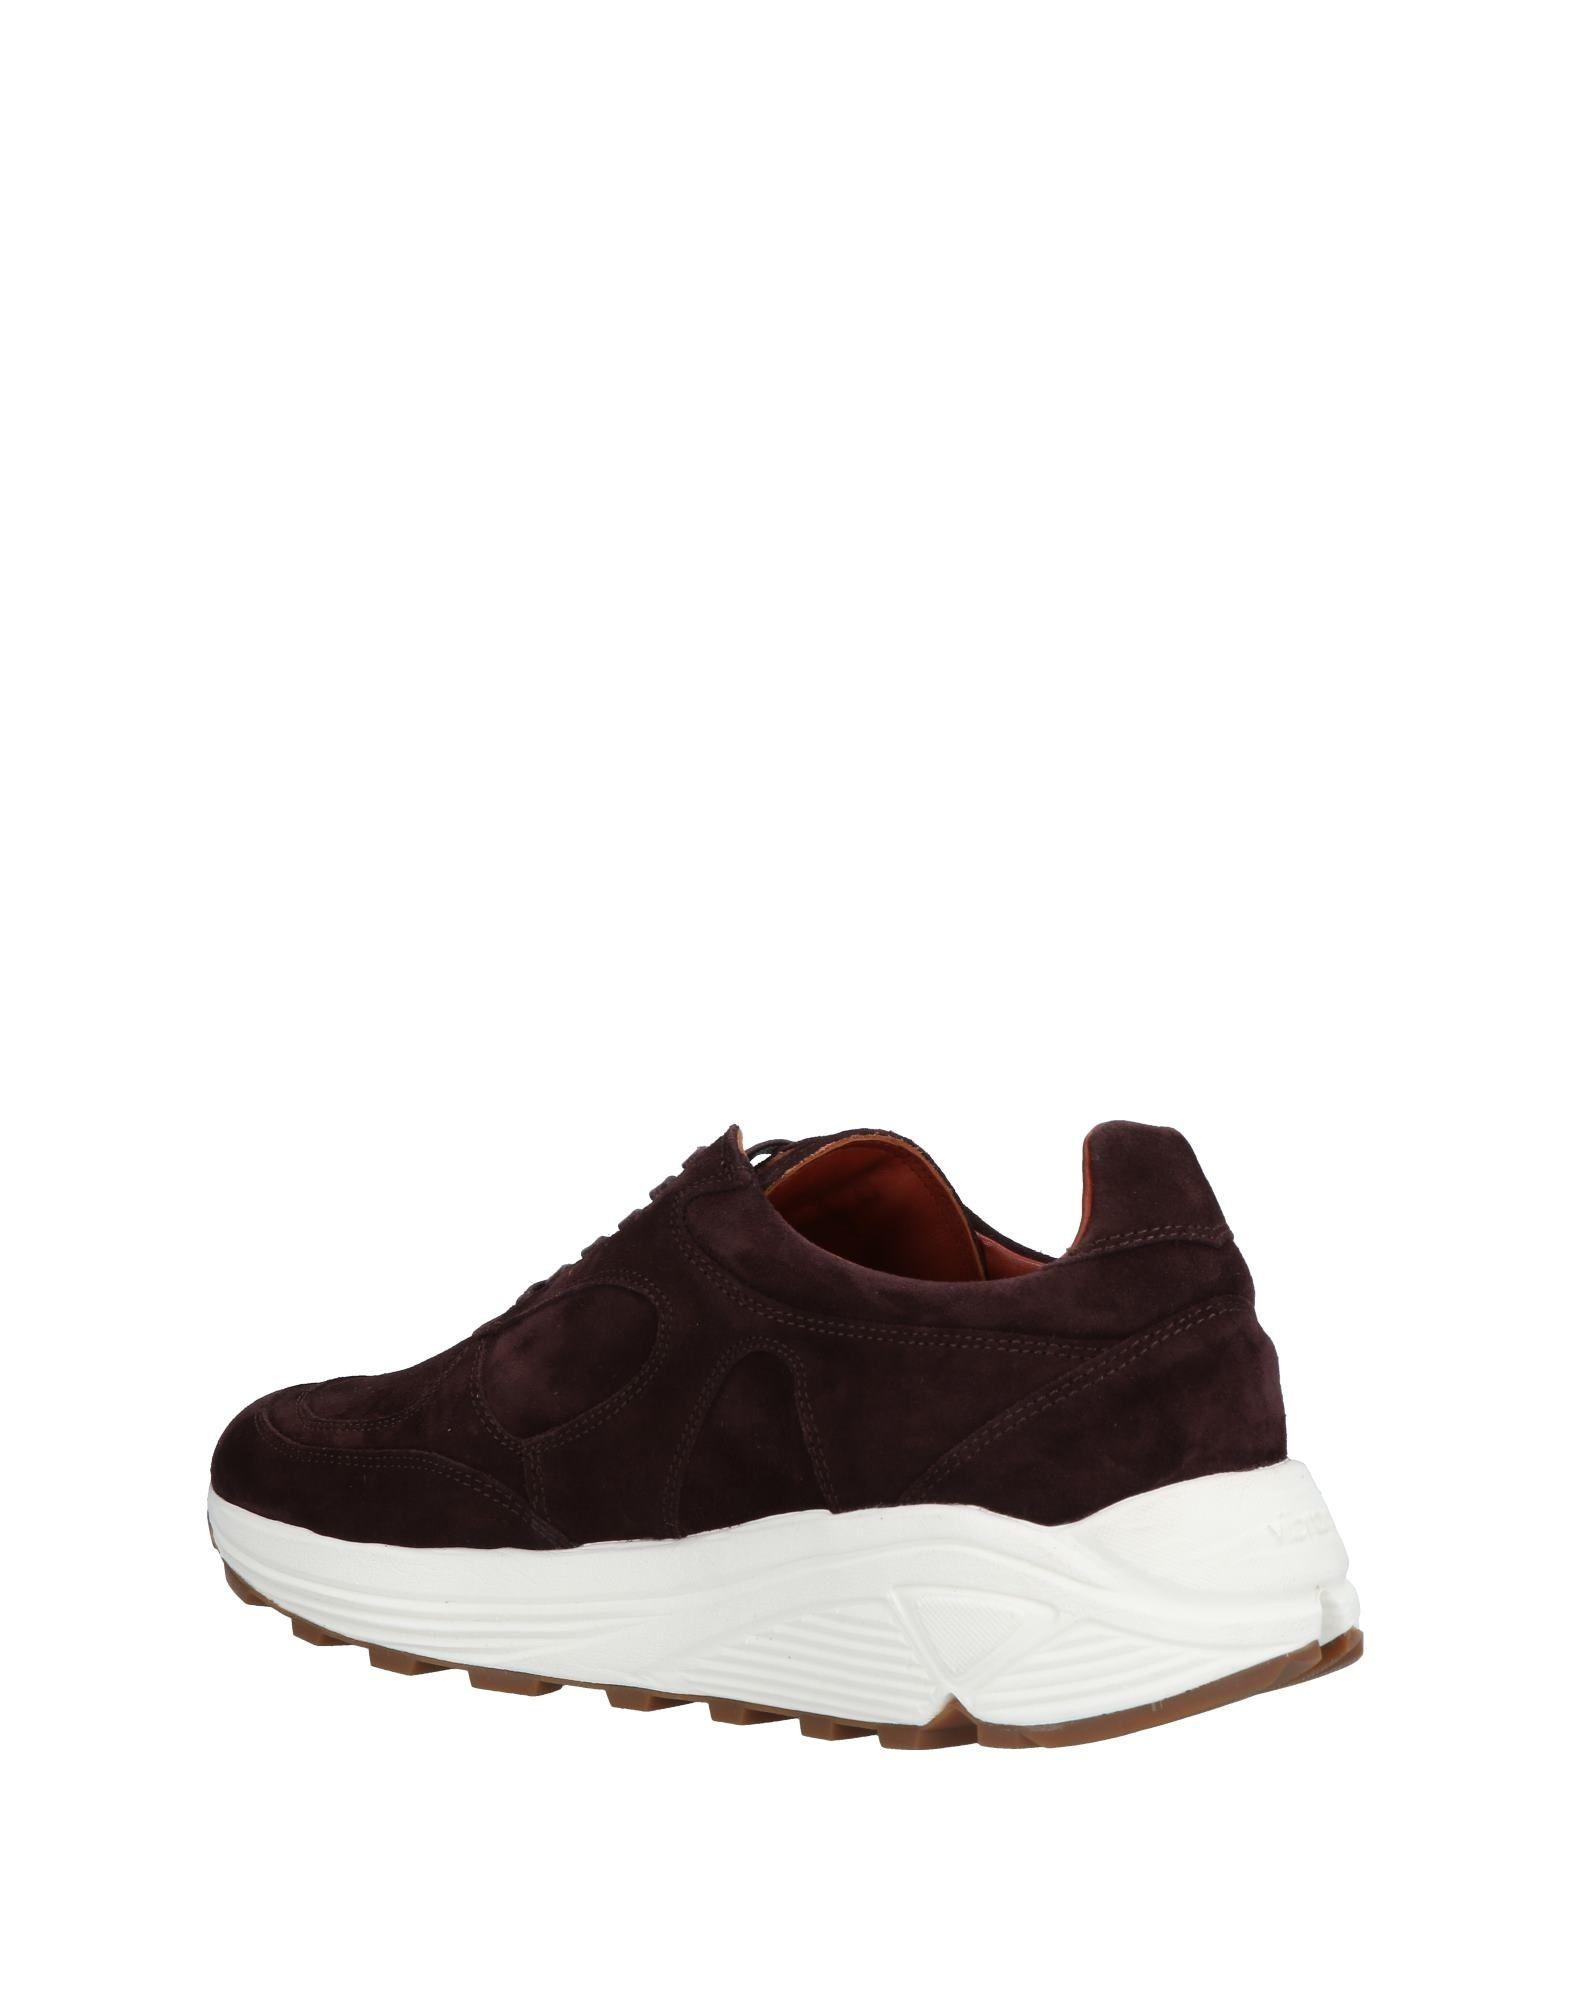 278e56b6cb2f83 Missoni Low-tops   Sneakers in Brown for Men - Lyst